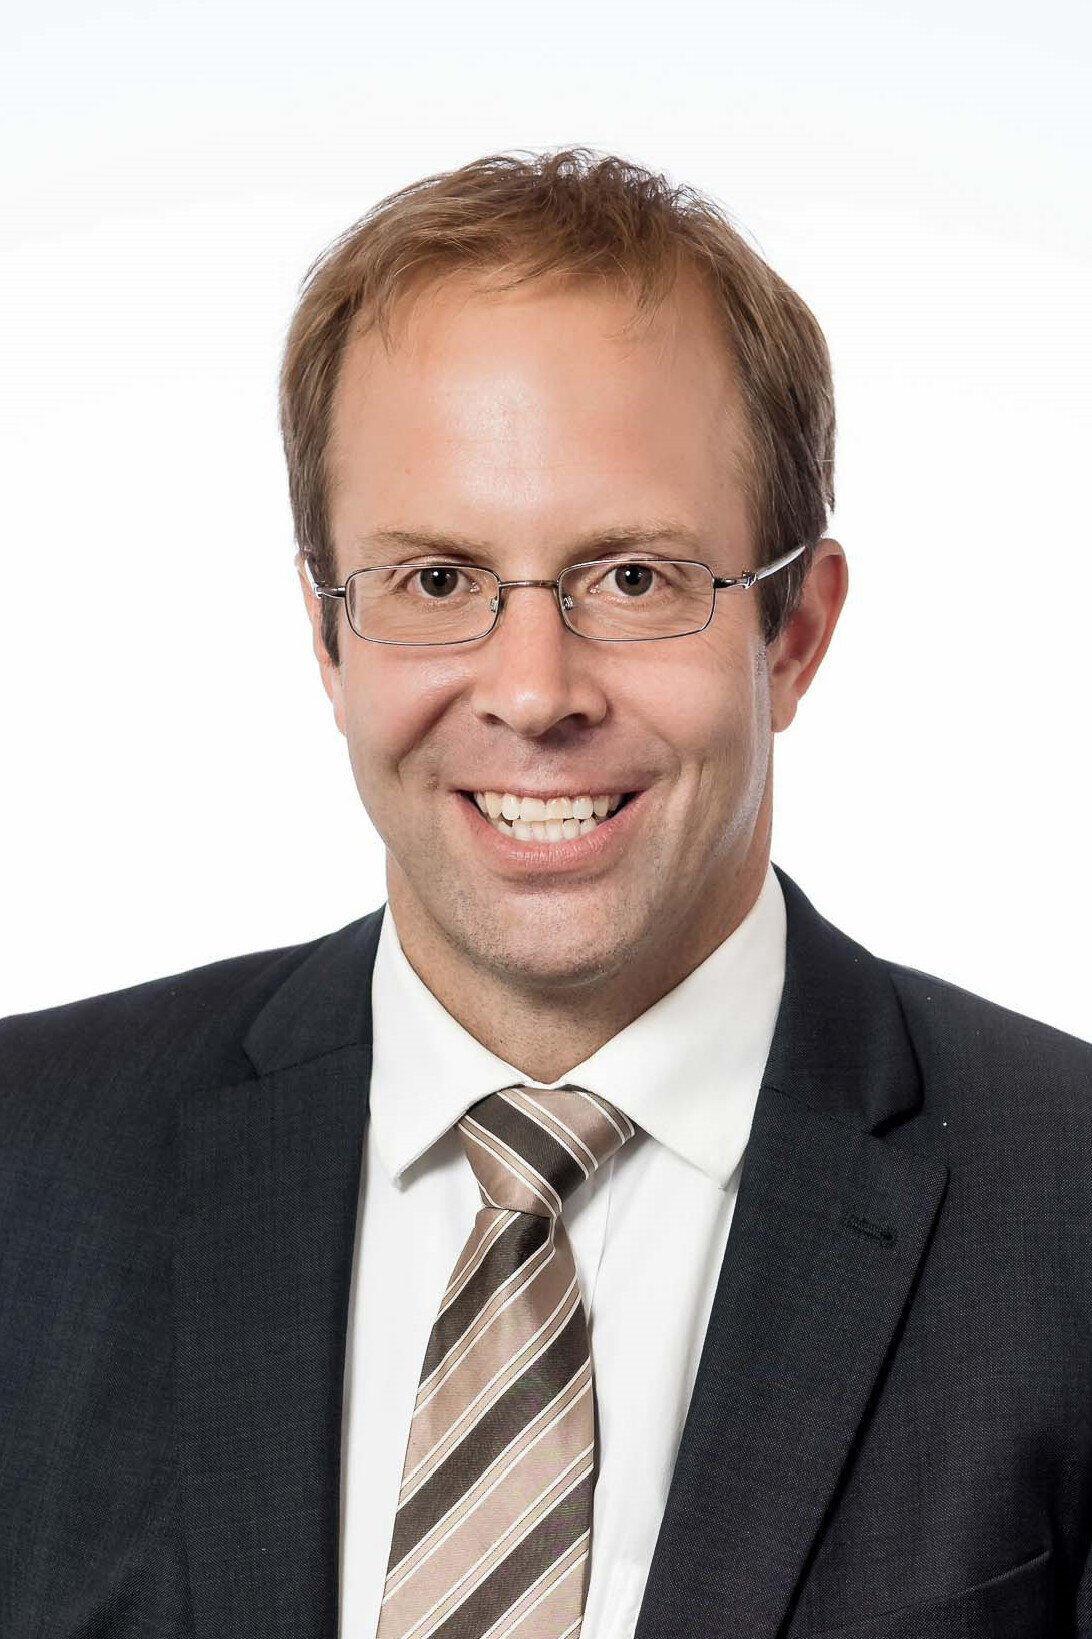 Dirk Keser